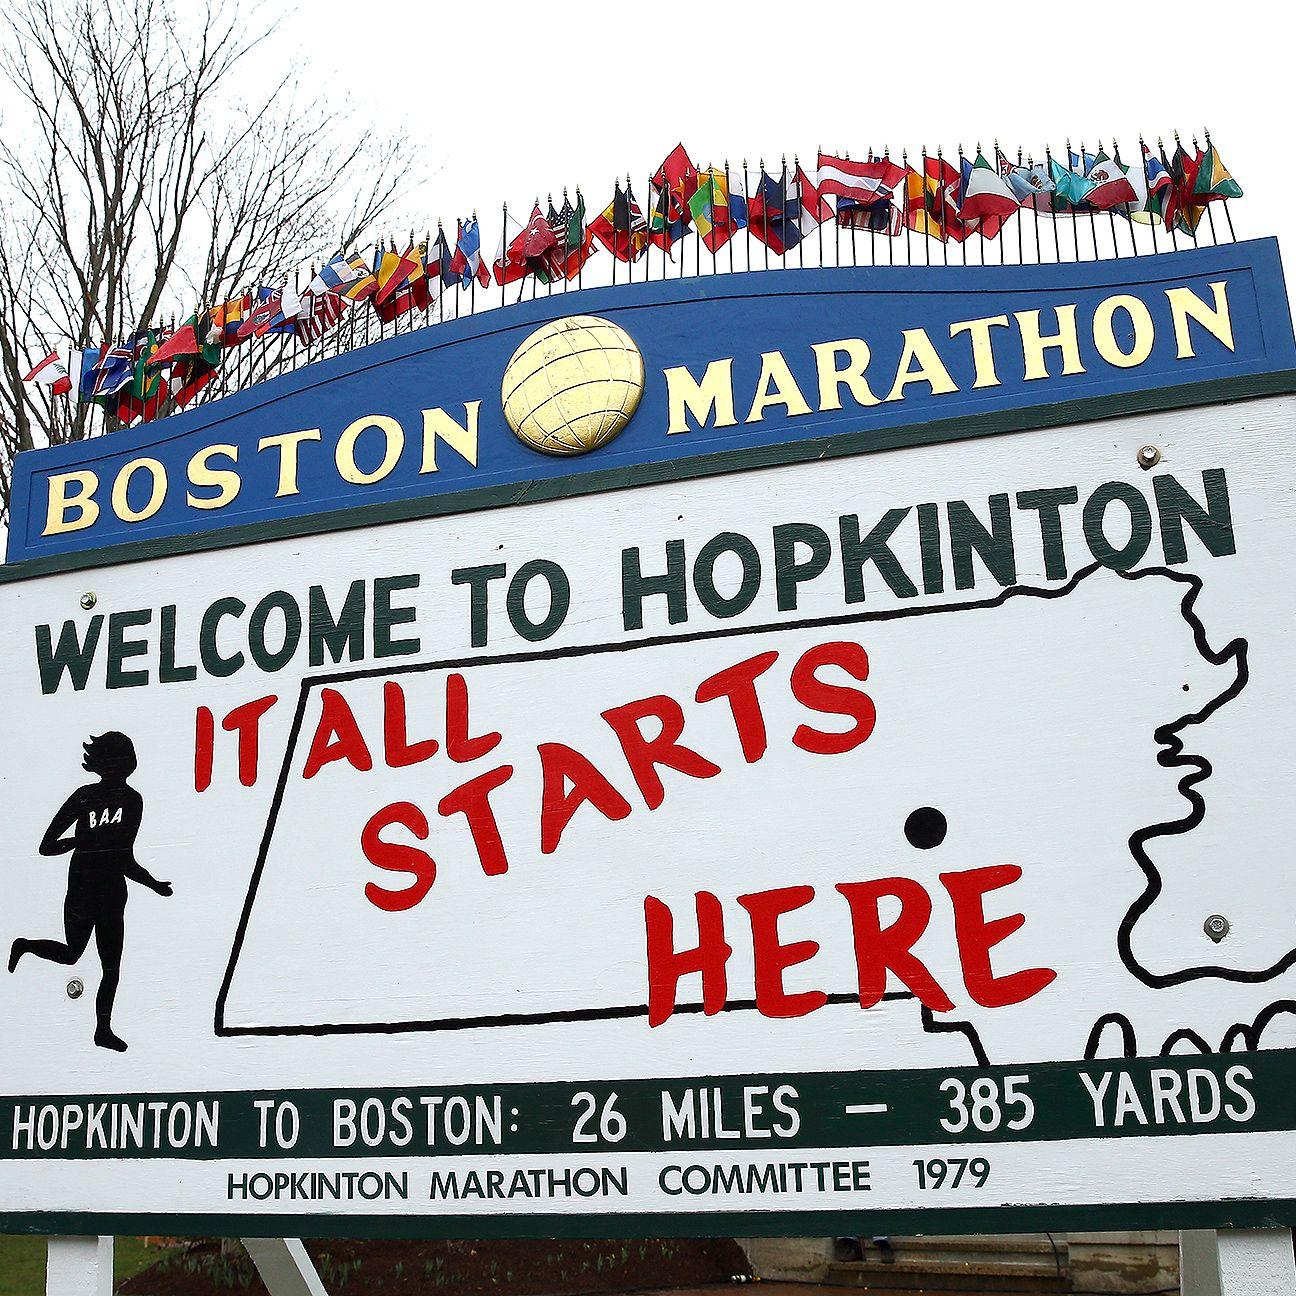 Runner man 2 espn boston marathon runner barbara tatge seeking man she